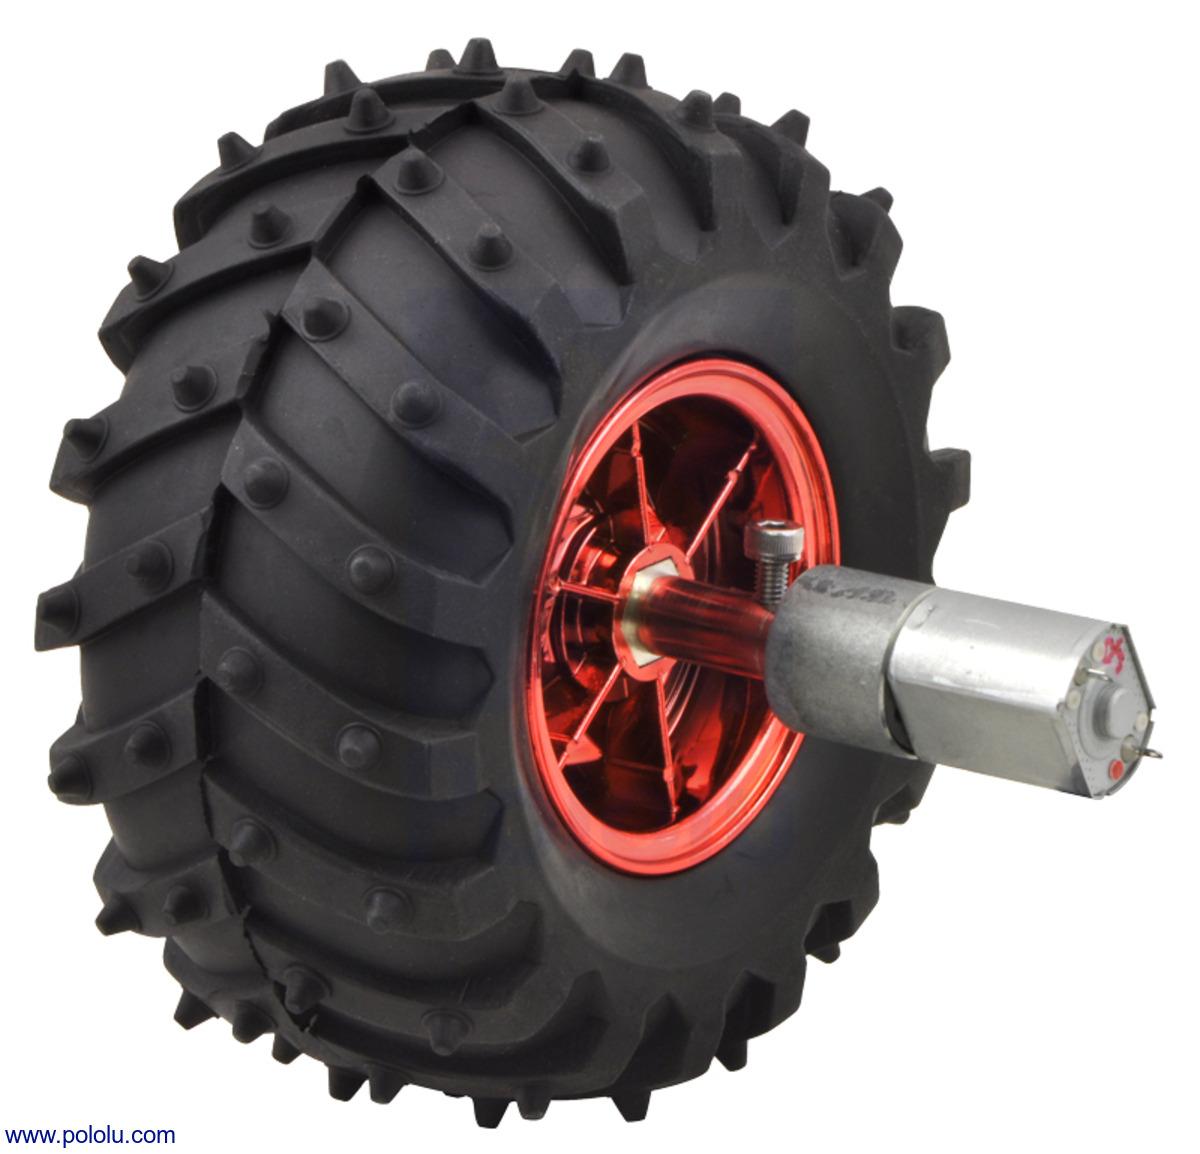 Pololu Dagu Wild Thumper Wheel 120x60mm Pair With 4mm Shaft